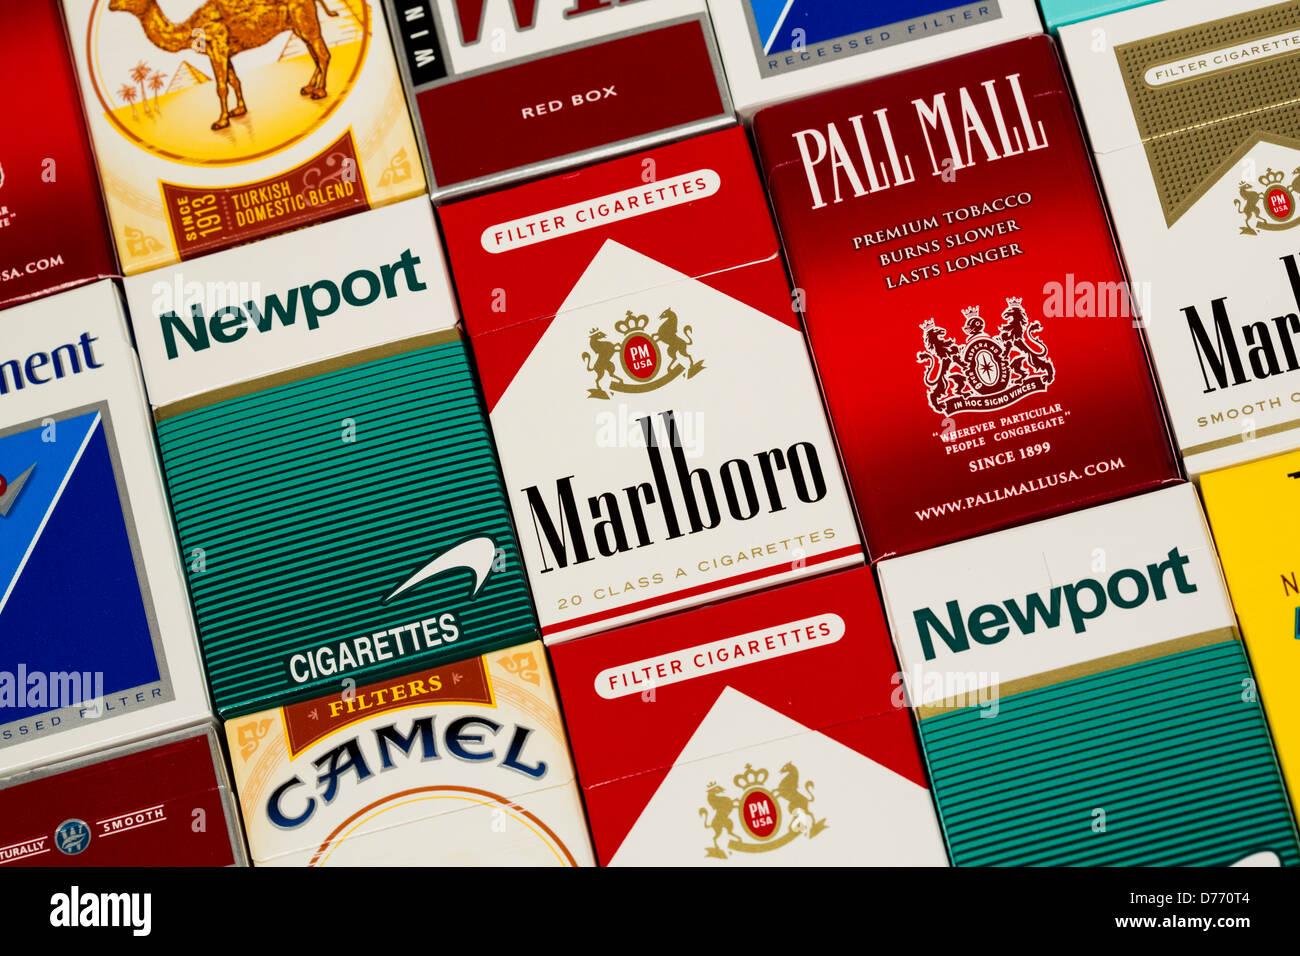 Florida buy cigarettes More